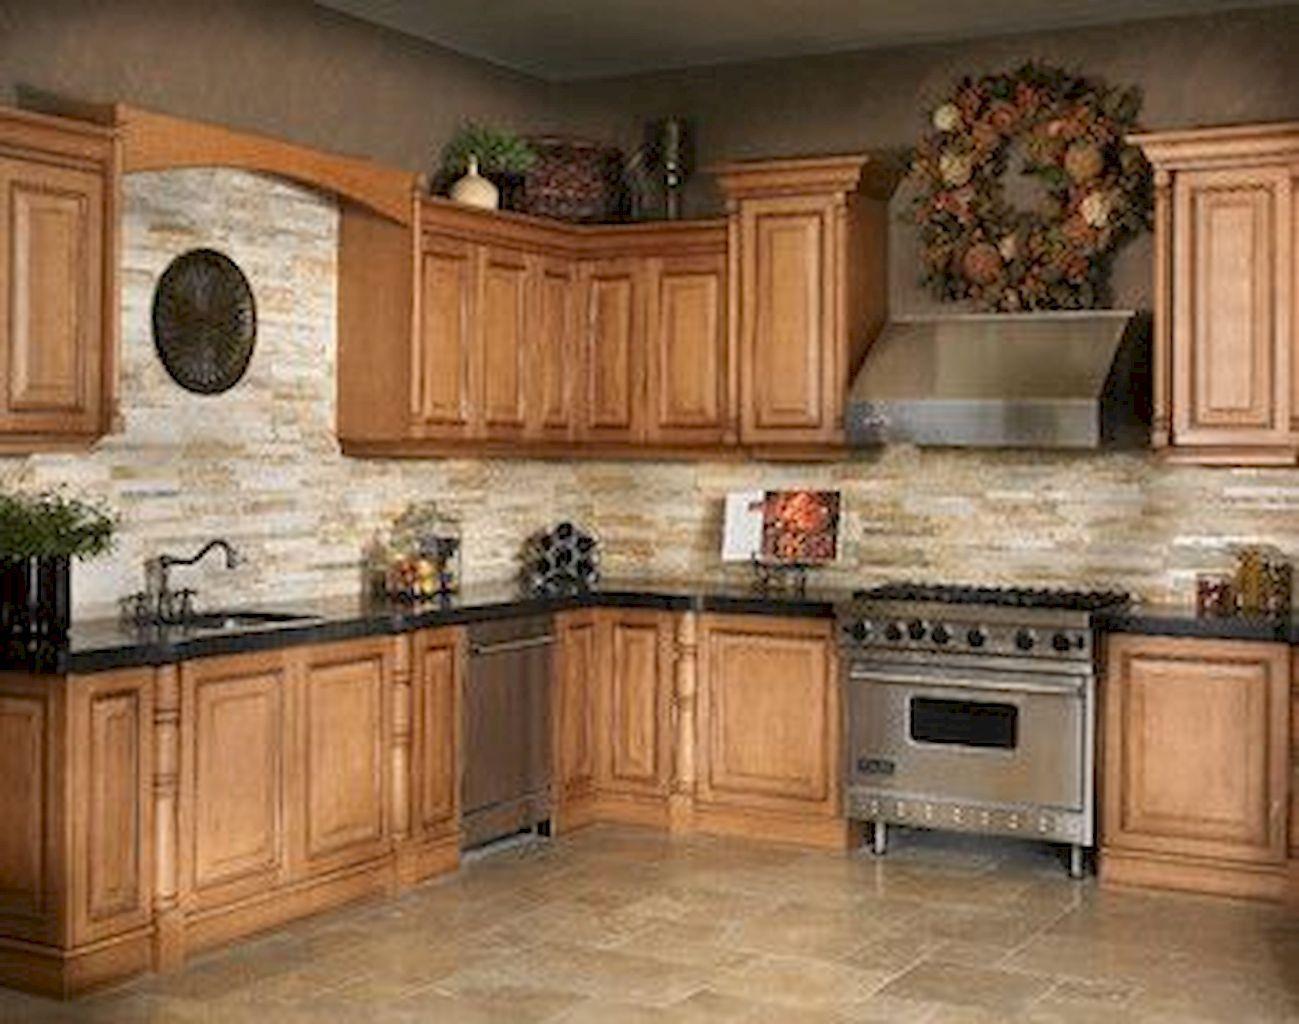 Best Kitchen Gallery: 100 Best Oak Kitchen Cabi S Ideas Decoration For Farmhouse Style of Oak Cabinets Kitchen on rachelxblog.com